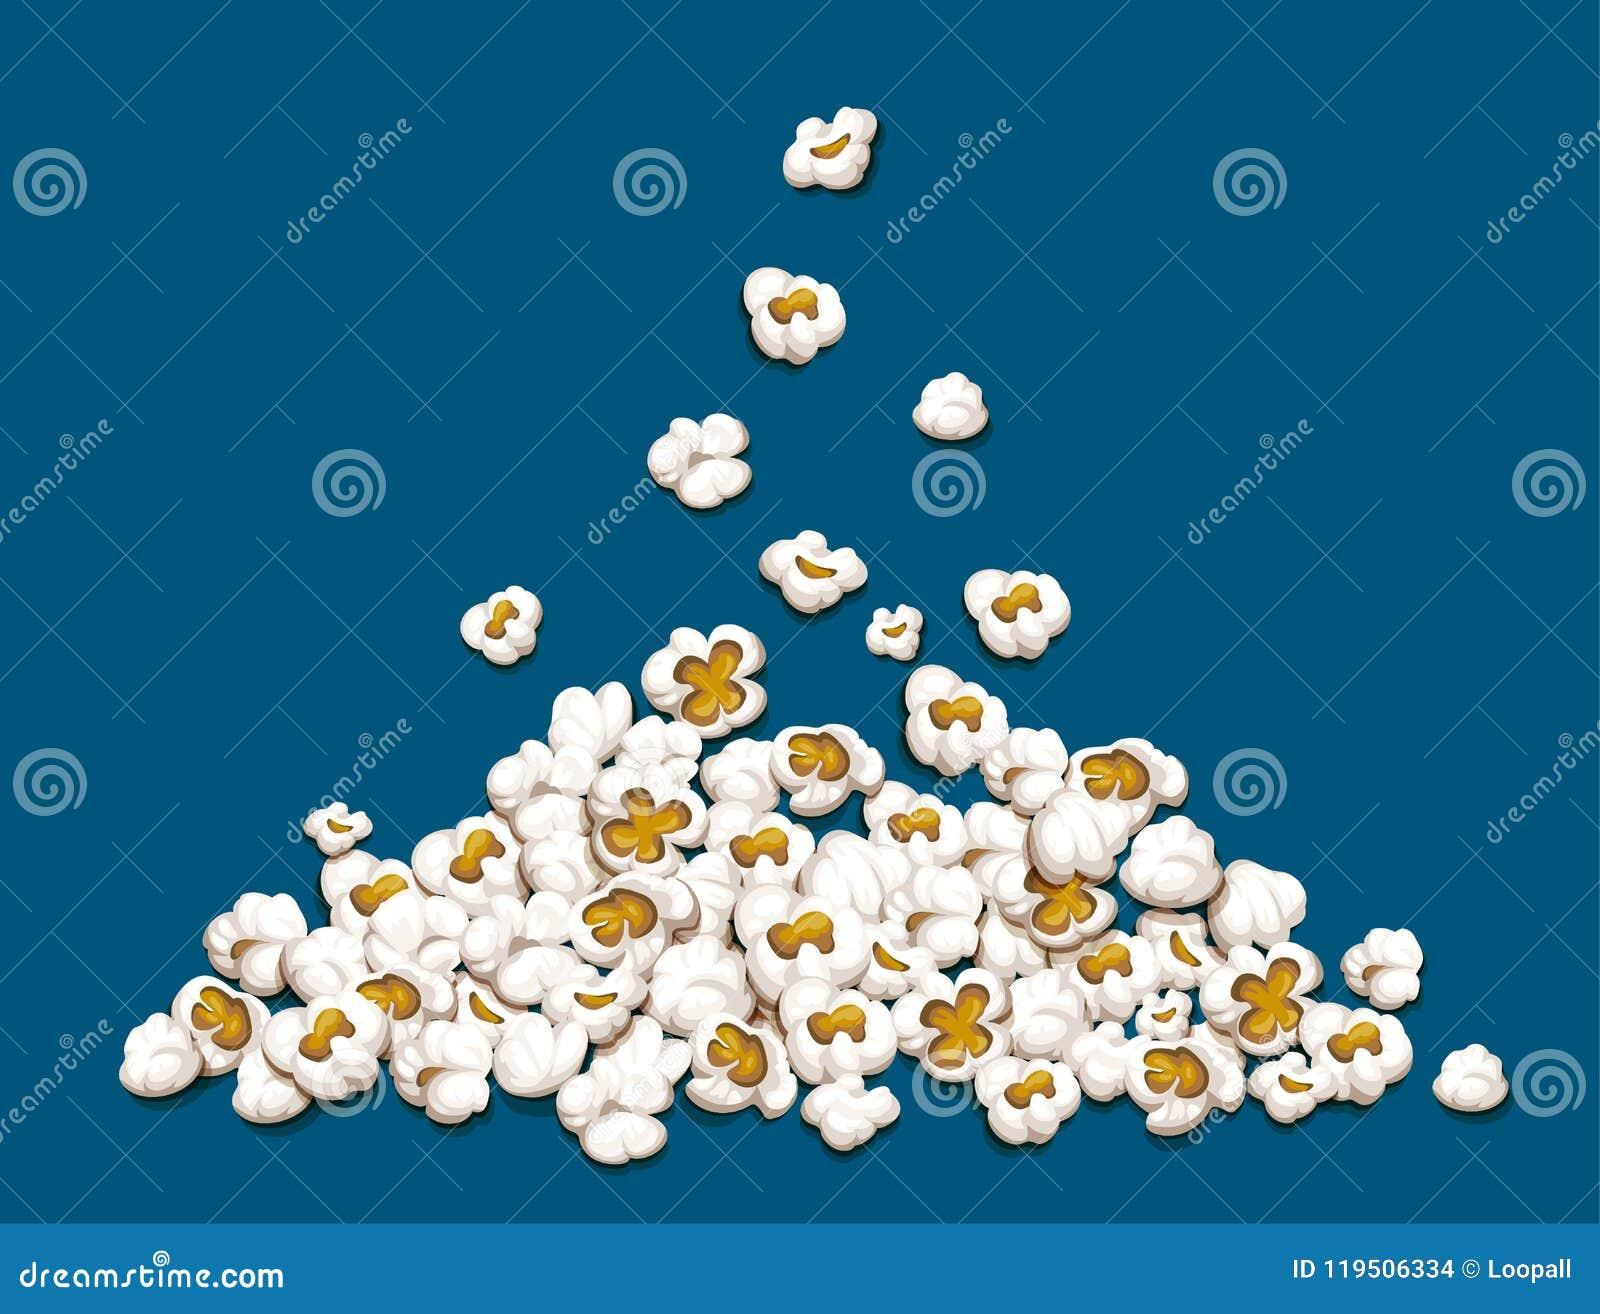 Popcorn fall down on heap vector illustration.